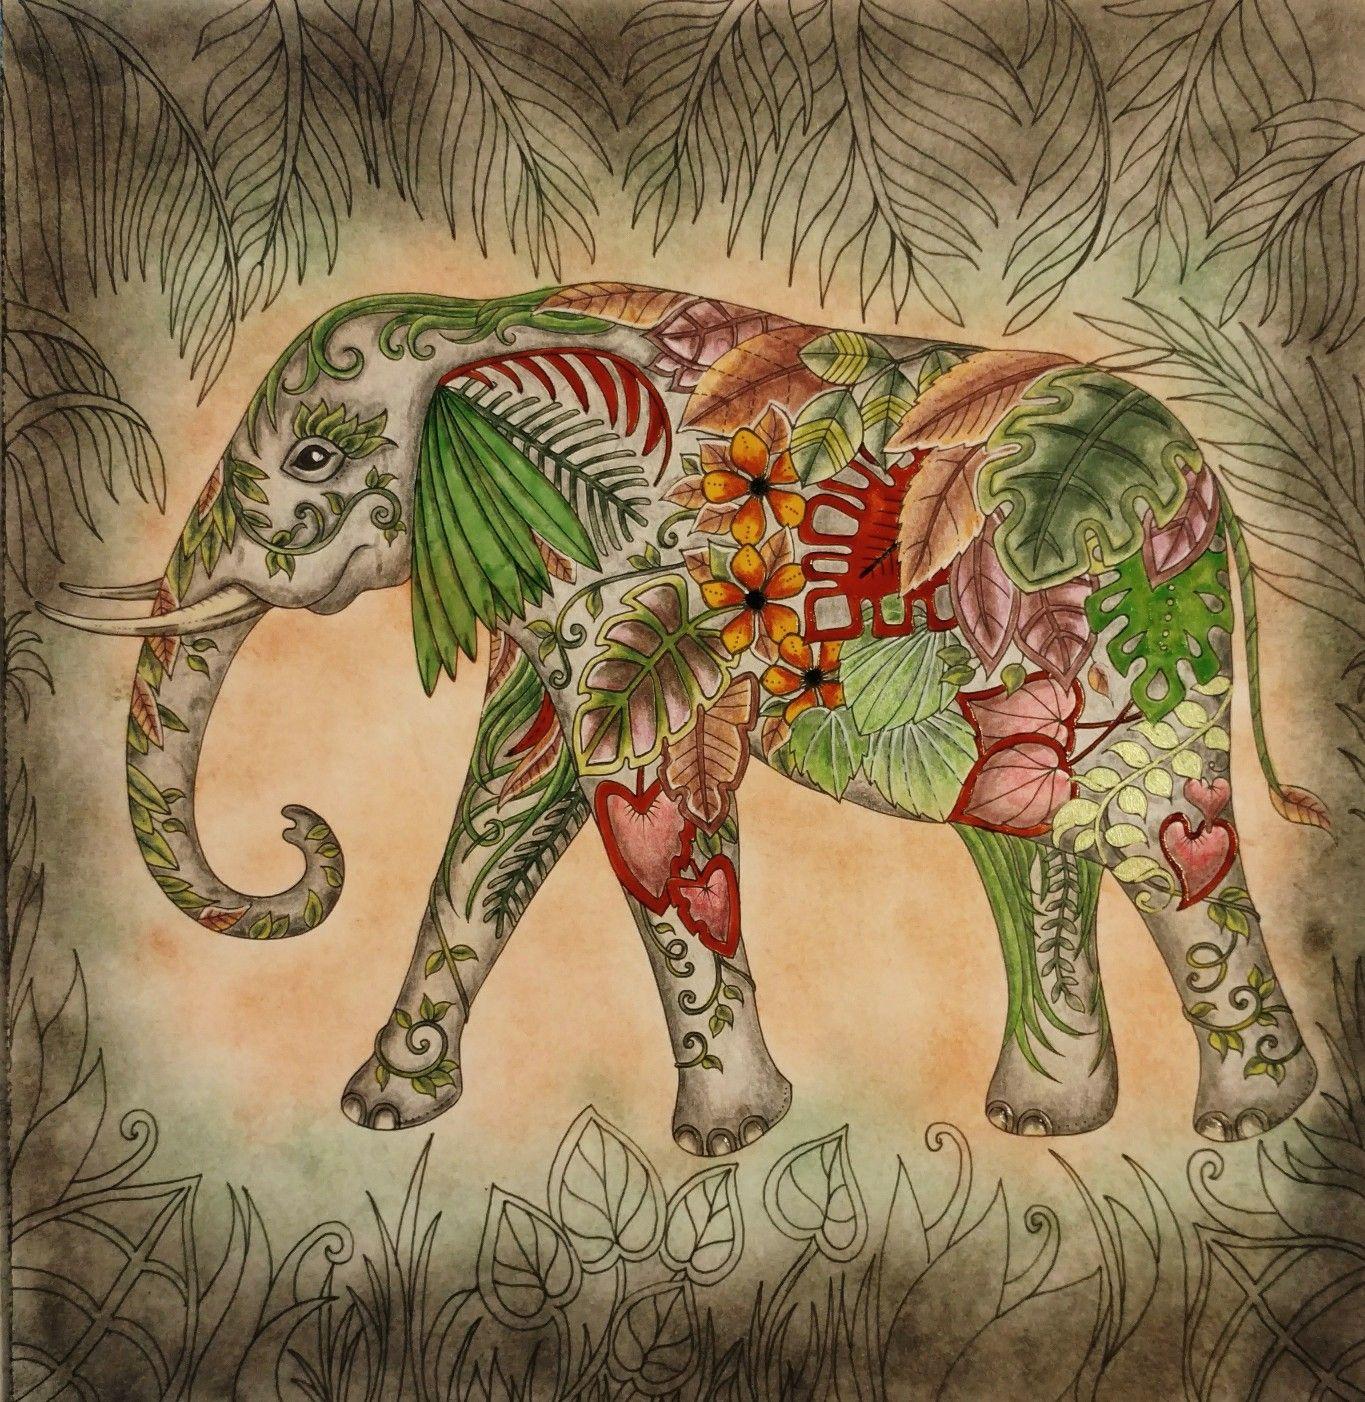 Magical Jungle Coloring Book Johanna Basford By Wendy Basford Coloring Book Johanna Basford Coloring Basford Coloring